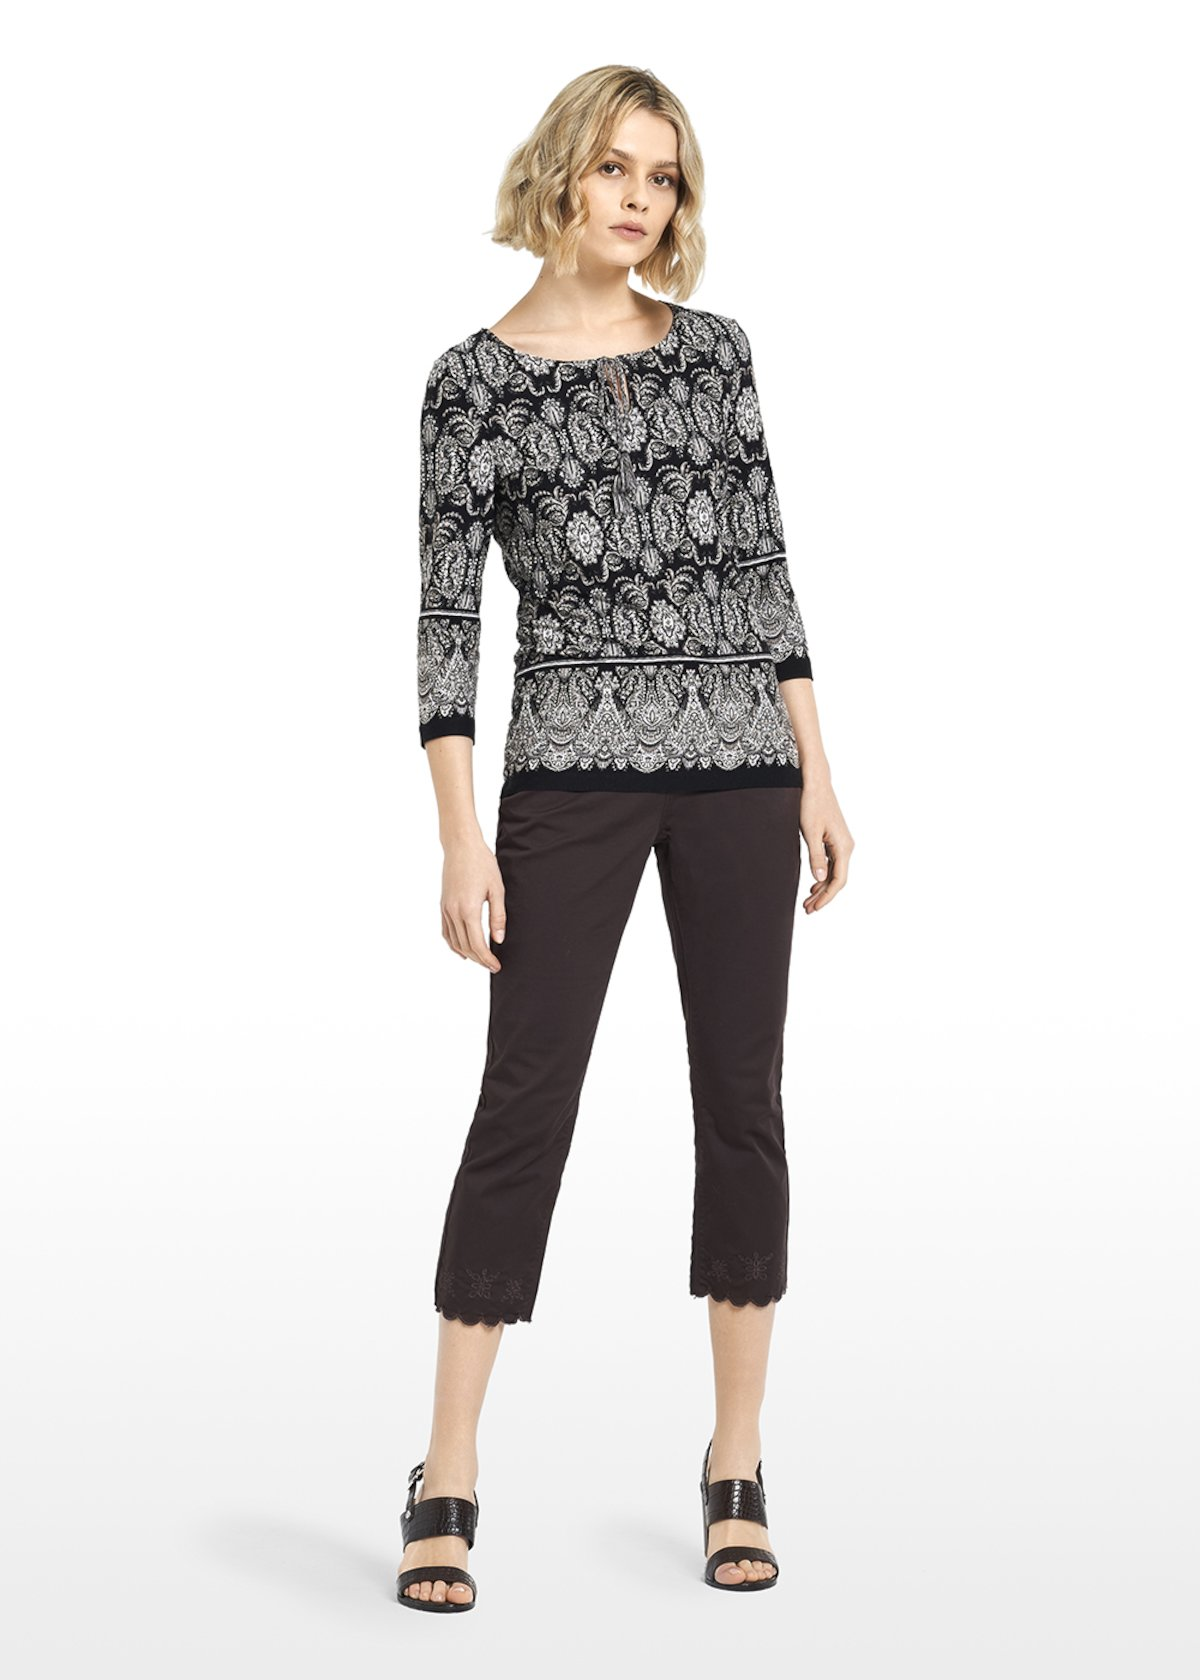 Sadar jersey t-shirt Paisley pattern with tassels - Black / White Fantasia - Woman